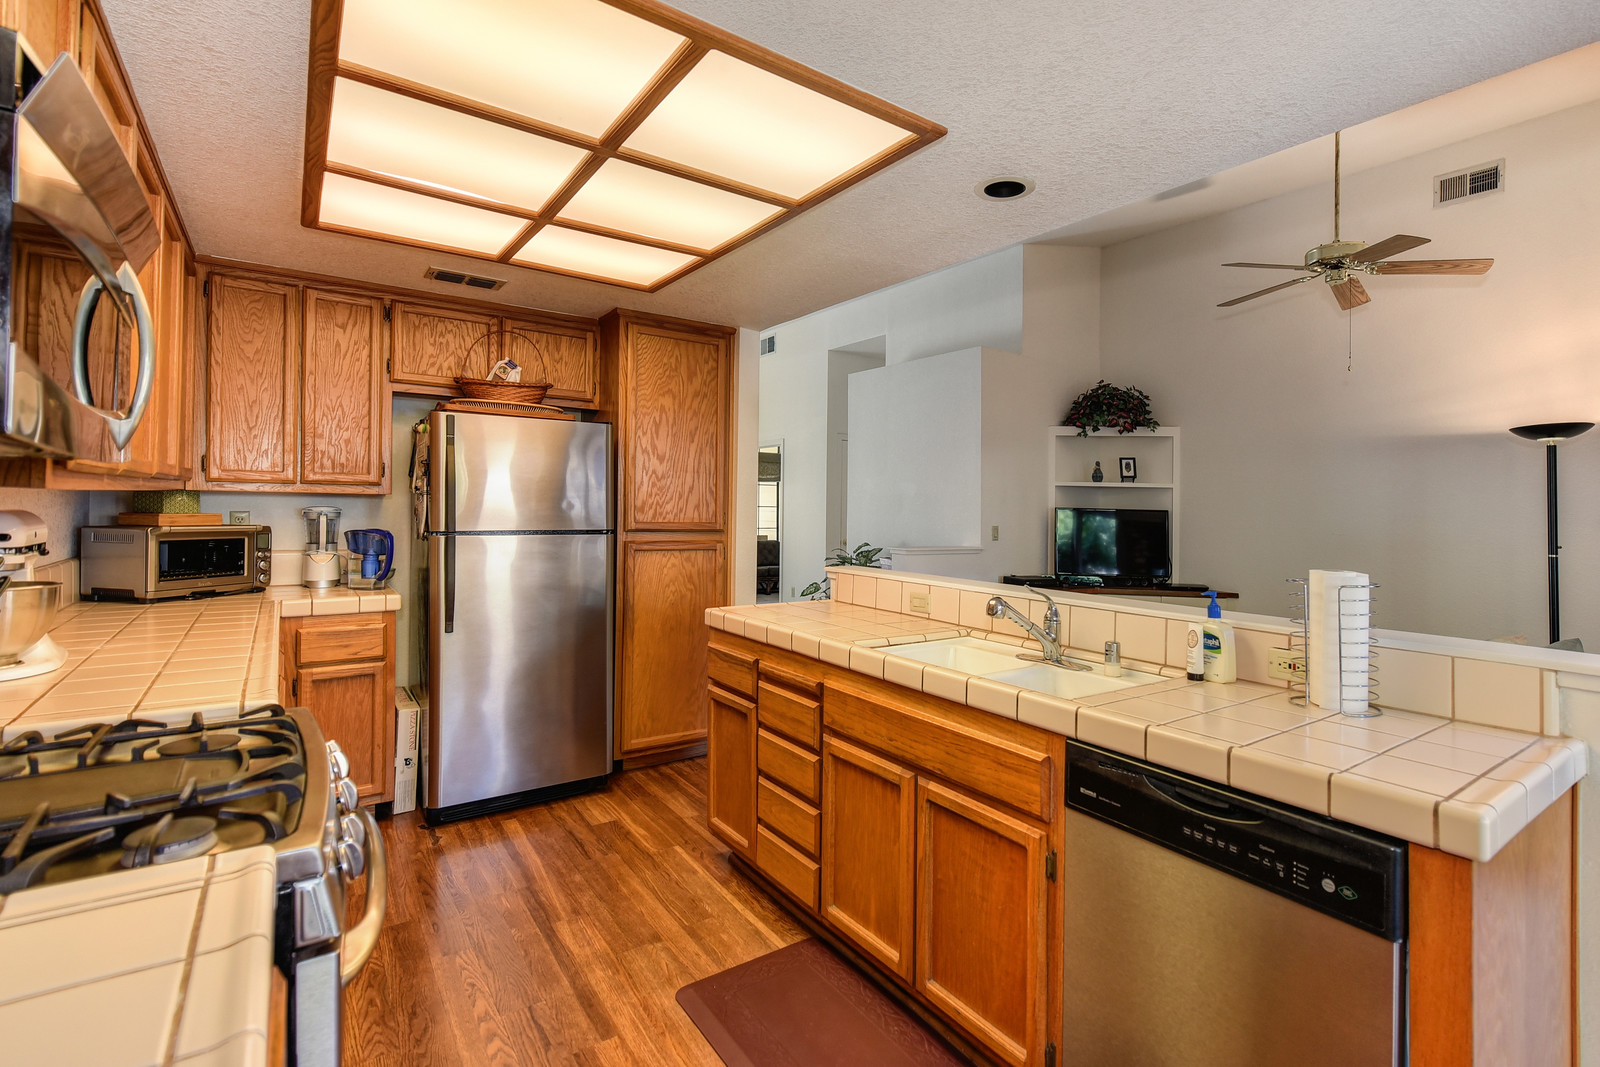 Kitchen 9158 Old Creek Rd, Elk Grove, Ca | Elk Grove home sold.